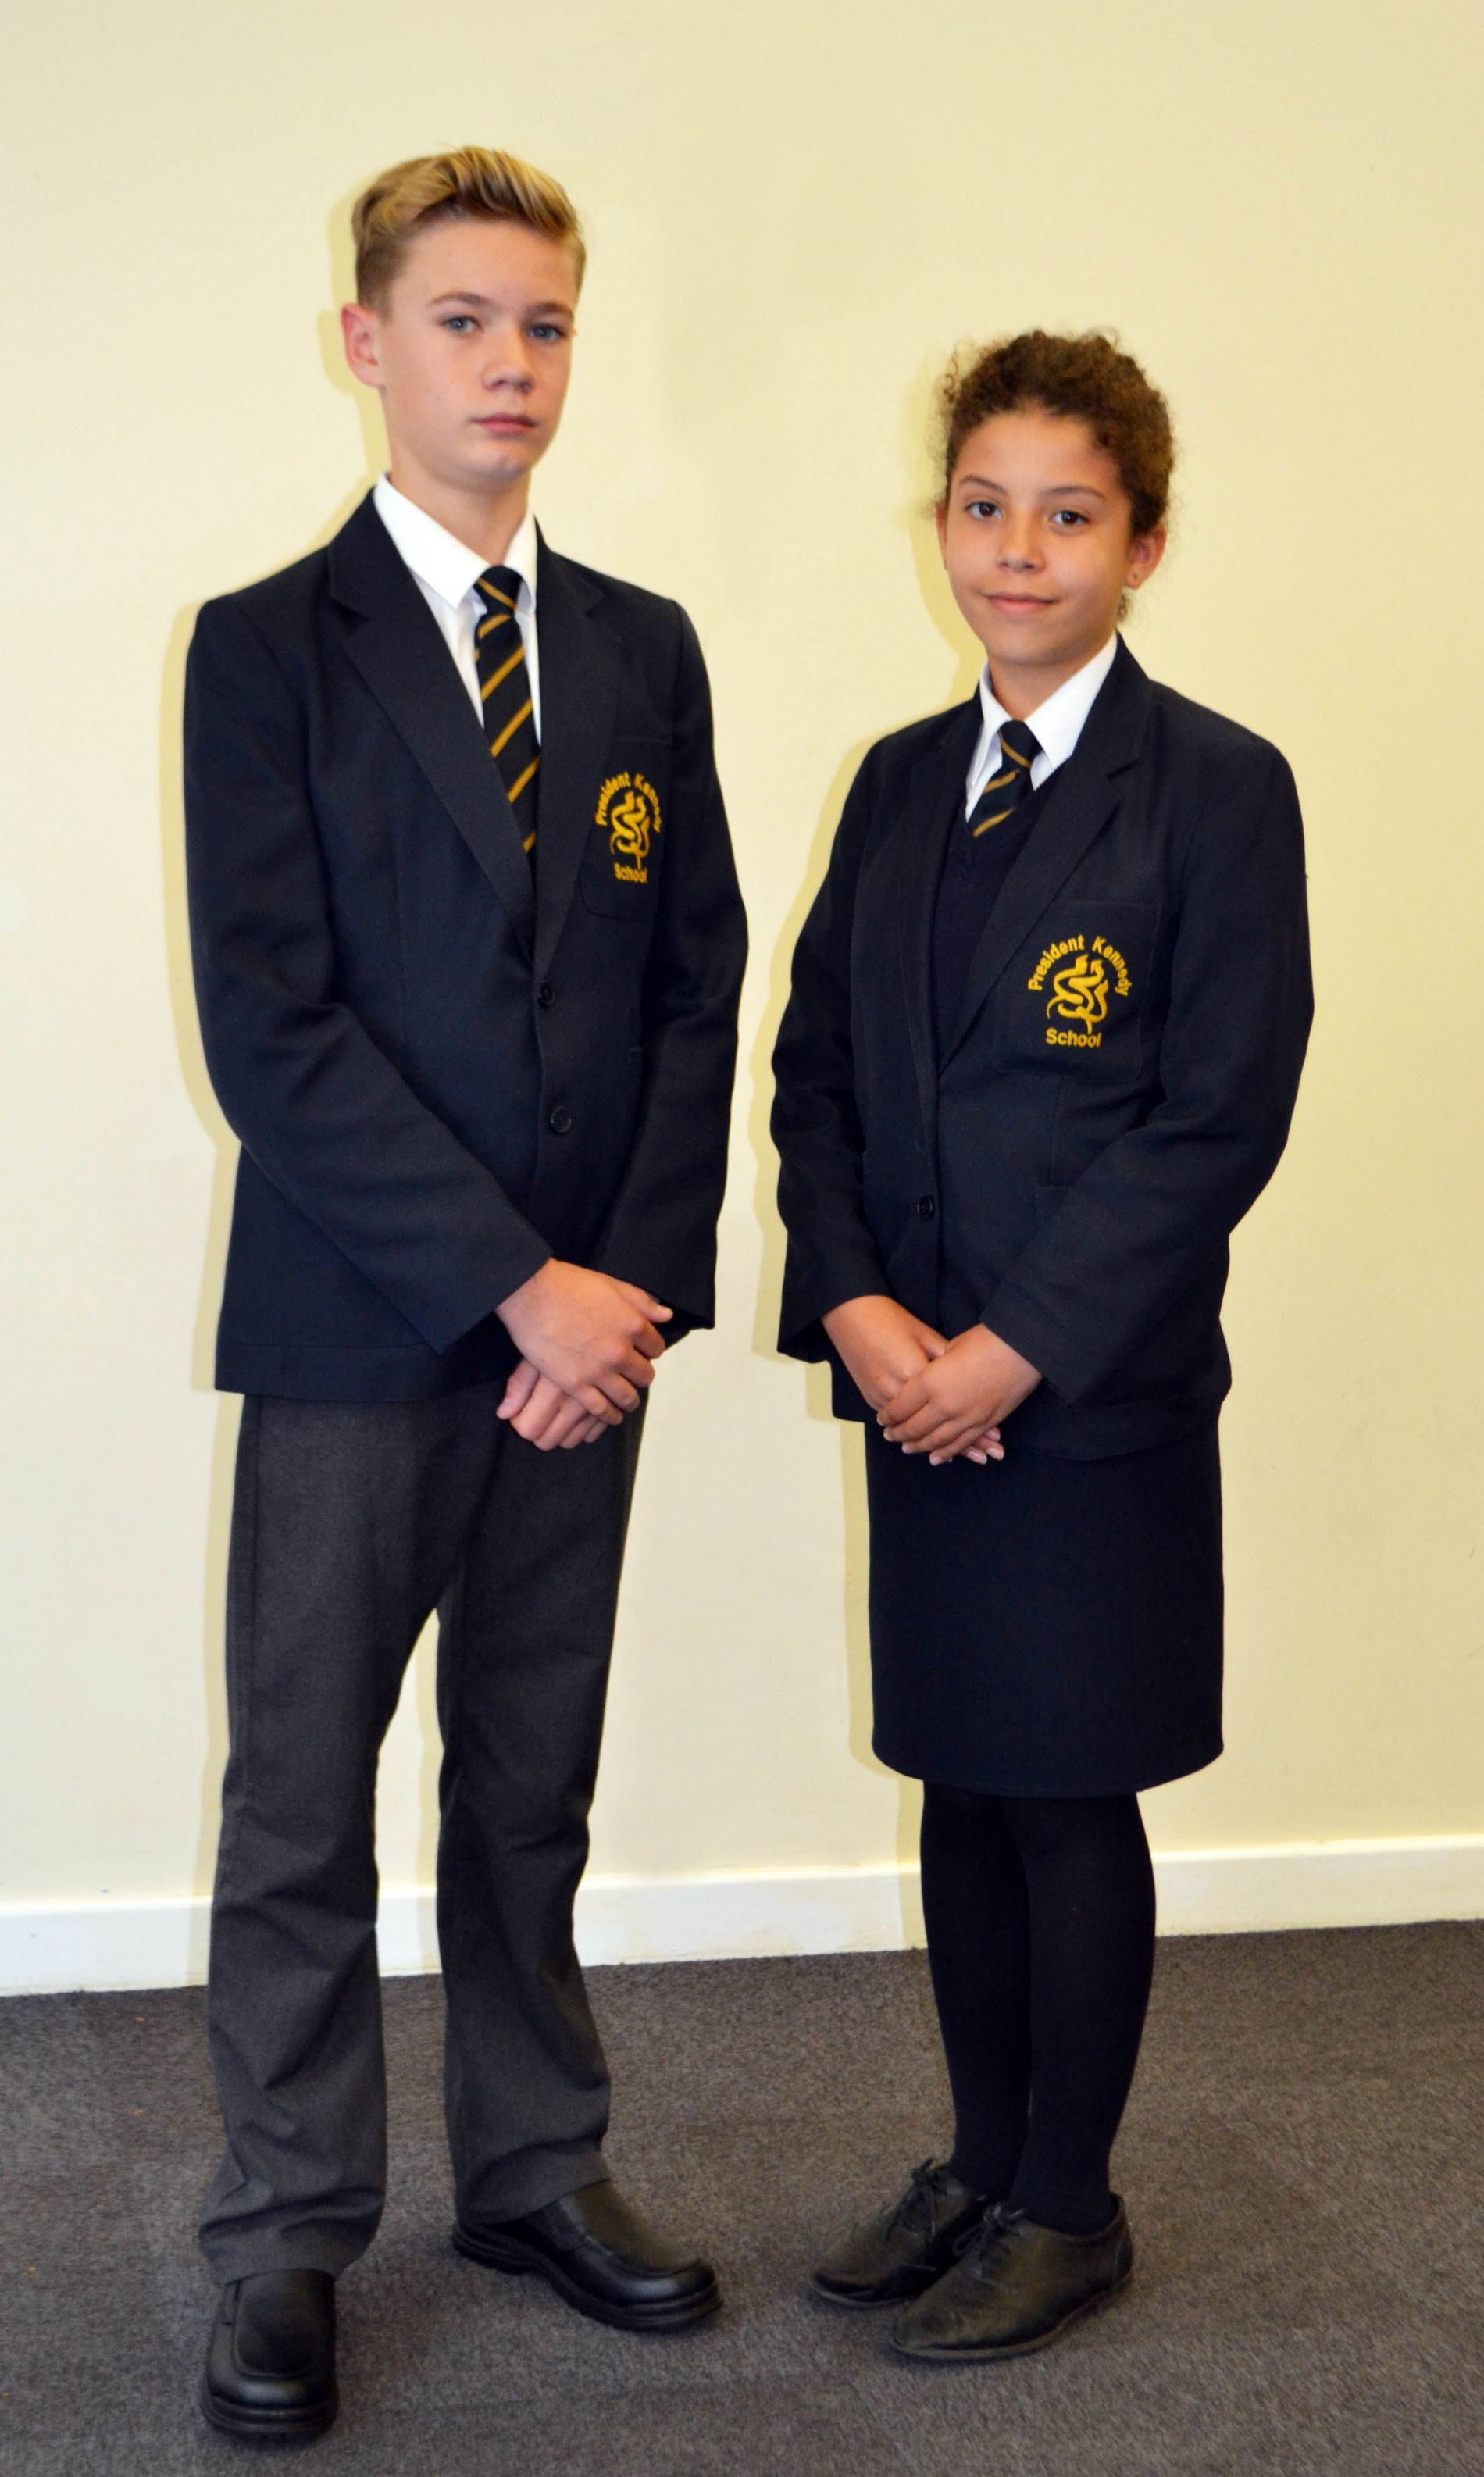 High for uniform school new photo